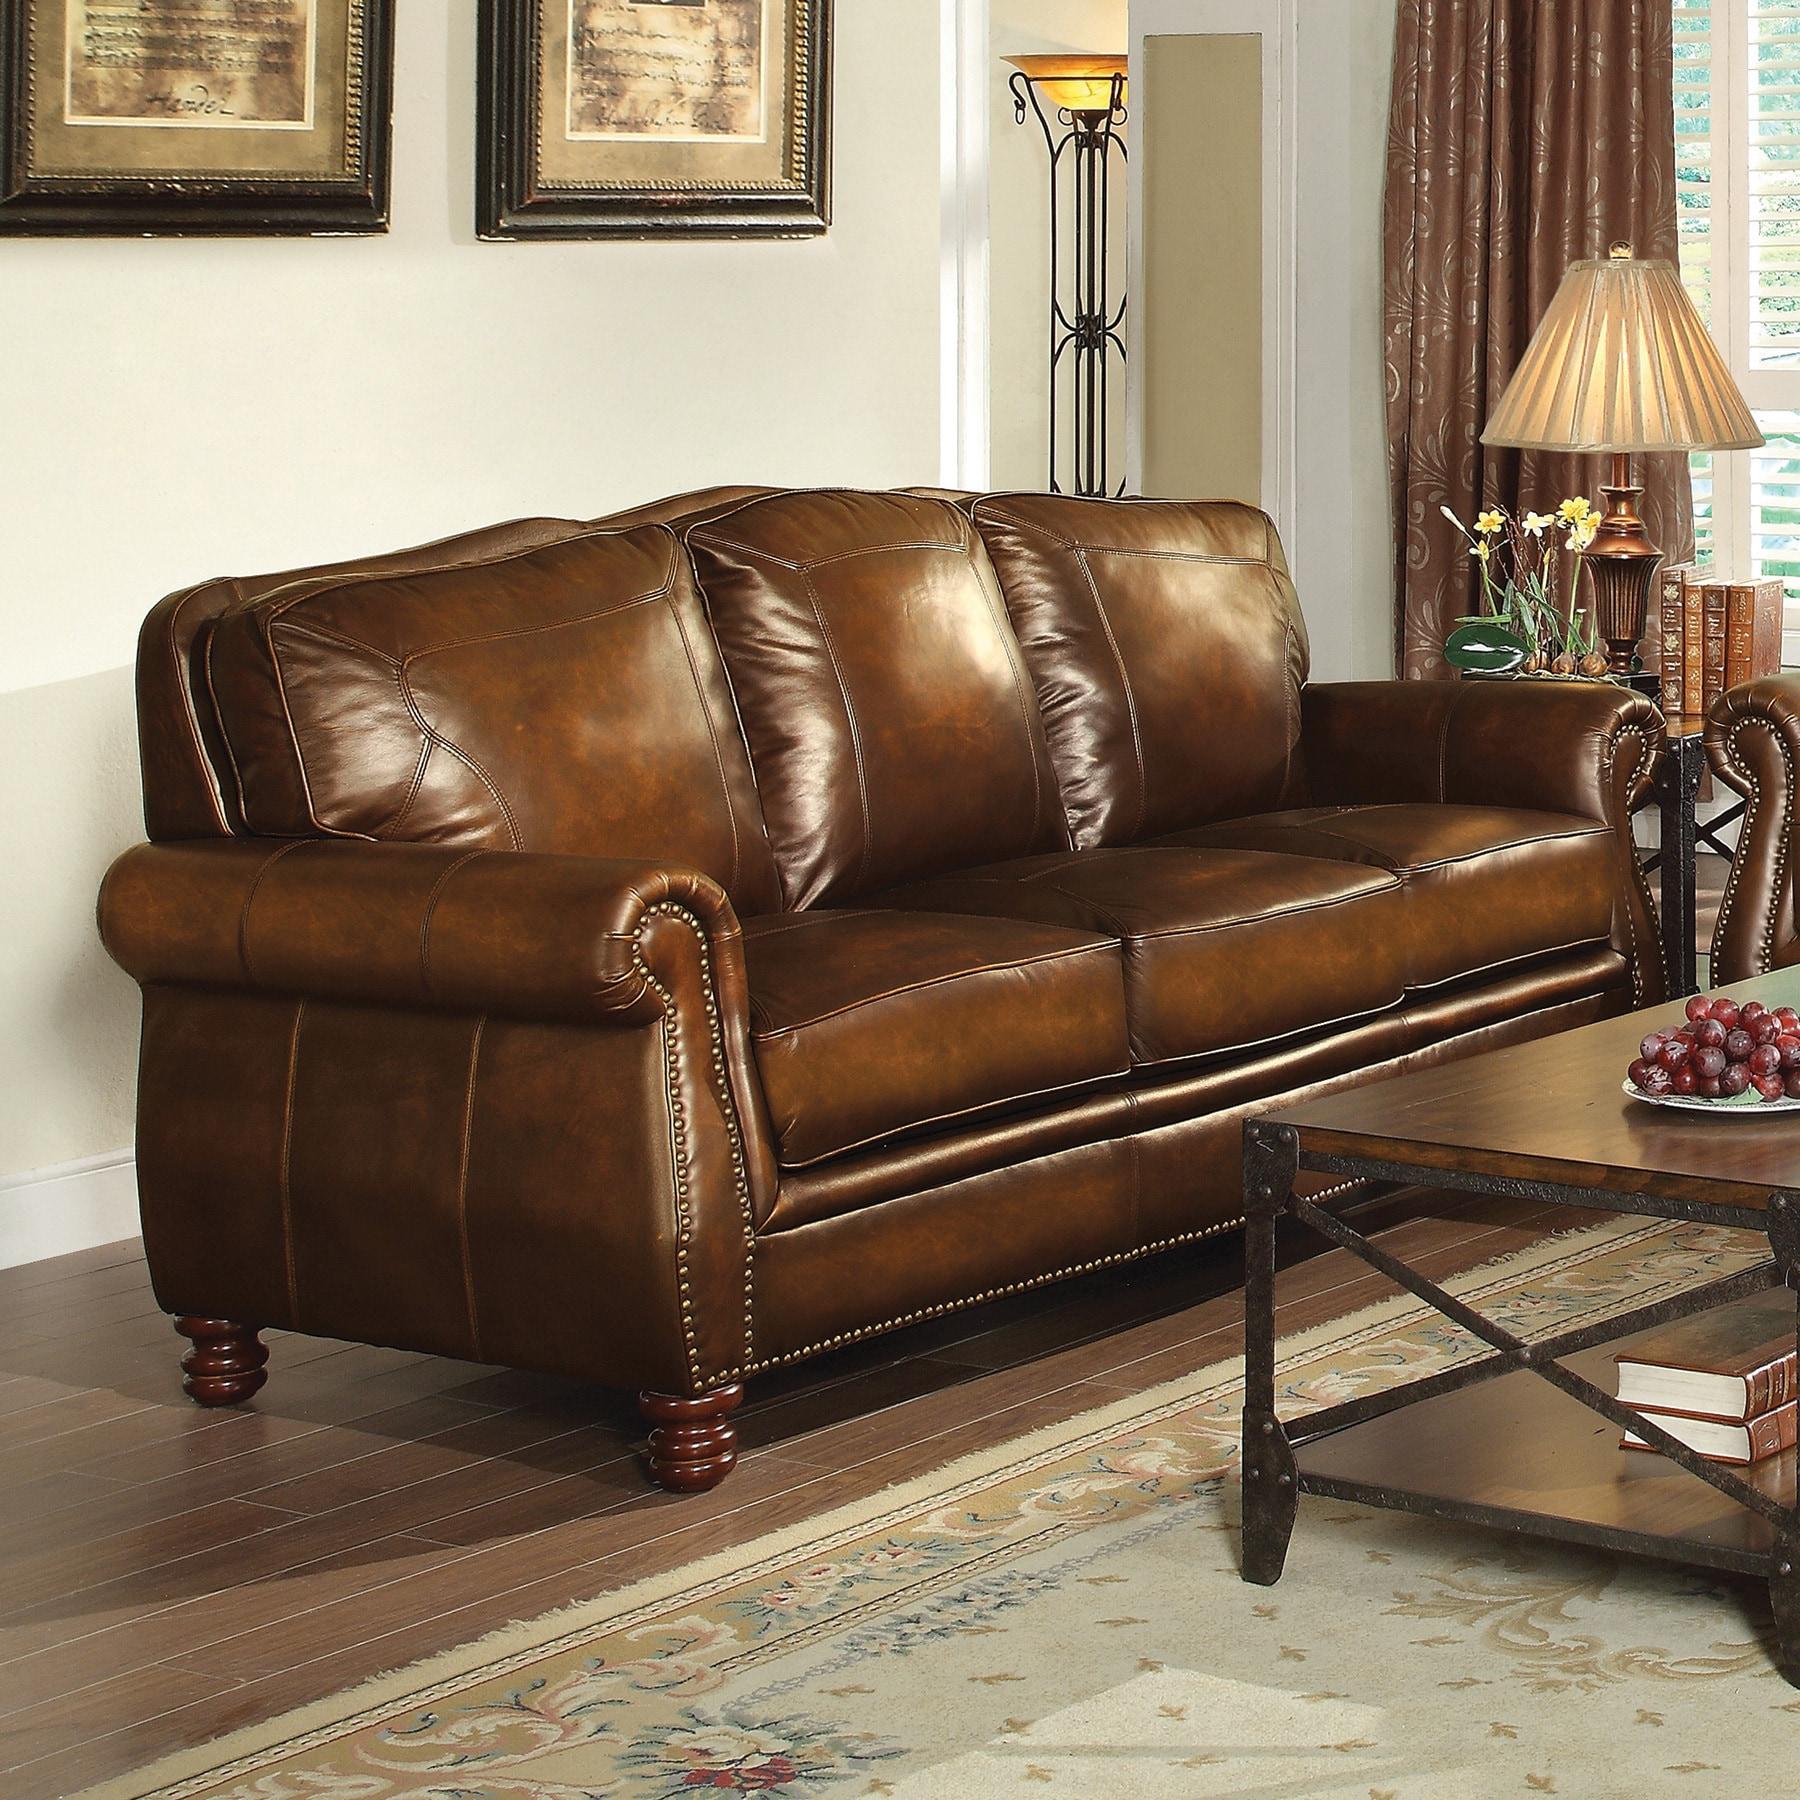 Cool Coaster Company Nailhead Trim Brown Leather Sofa Creativecarmelina Interior Chair Design Creativecarmelinacom